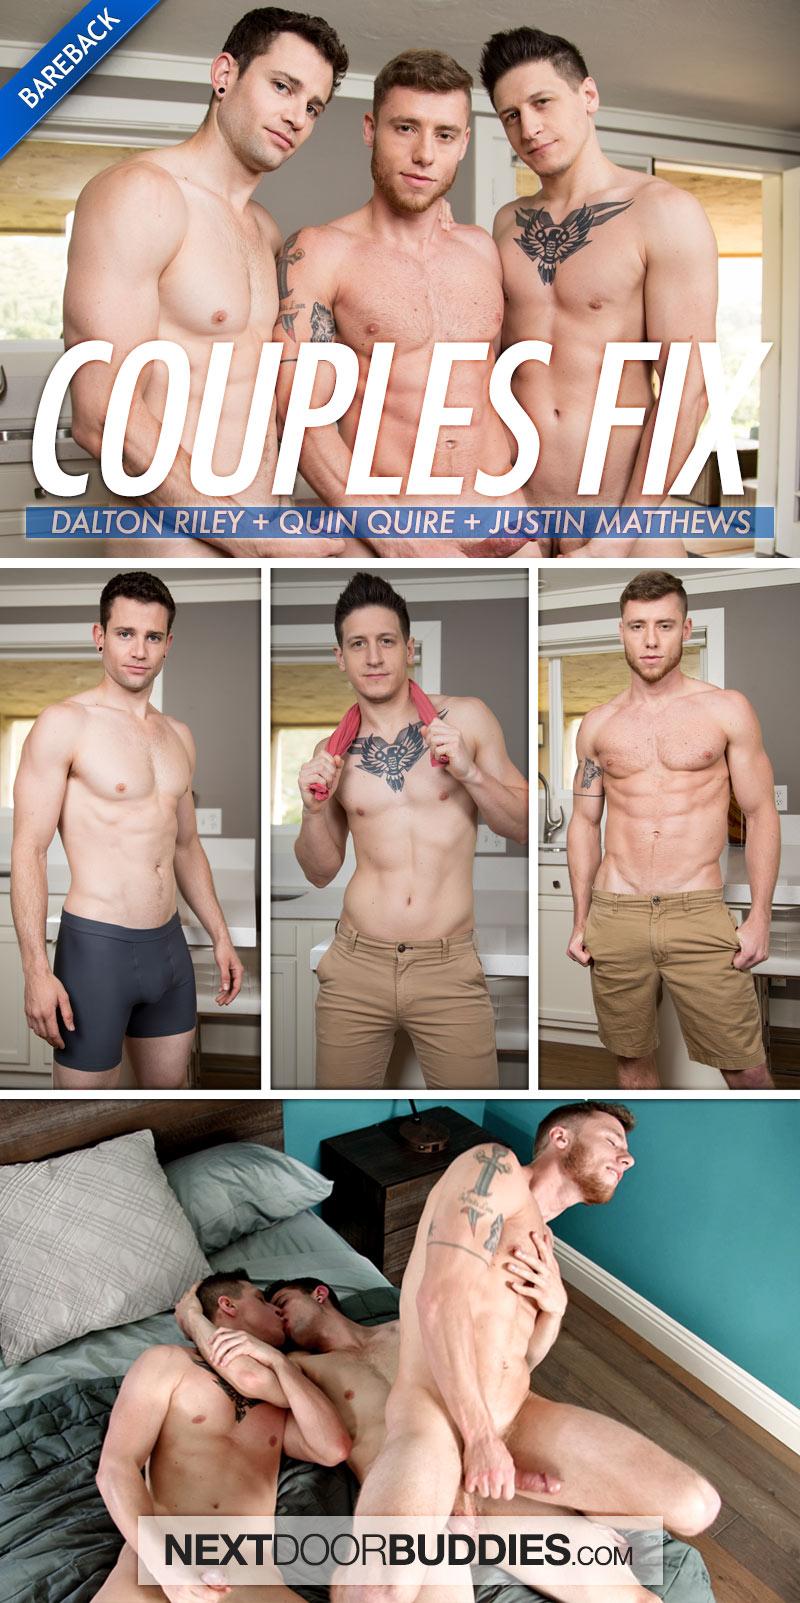 Couples Fix (Dalton Riley, Quin Quire and Justin Matthews) at Next Door Buddies